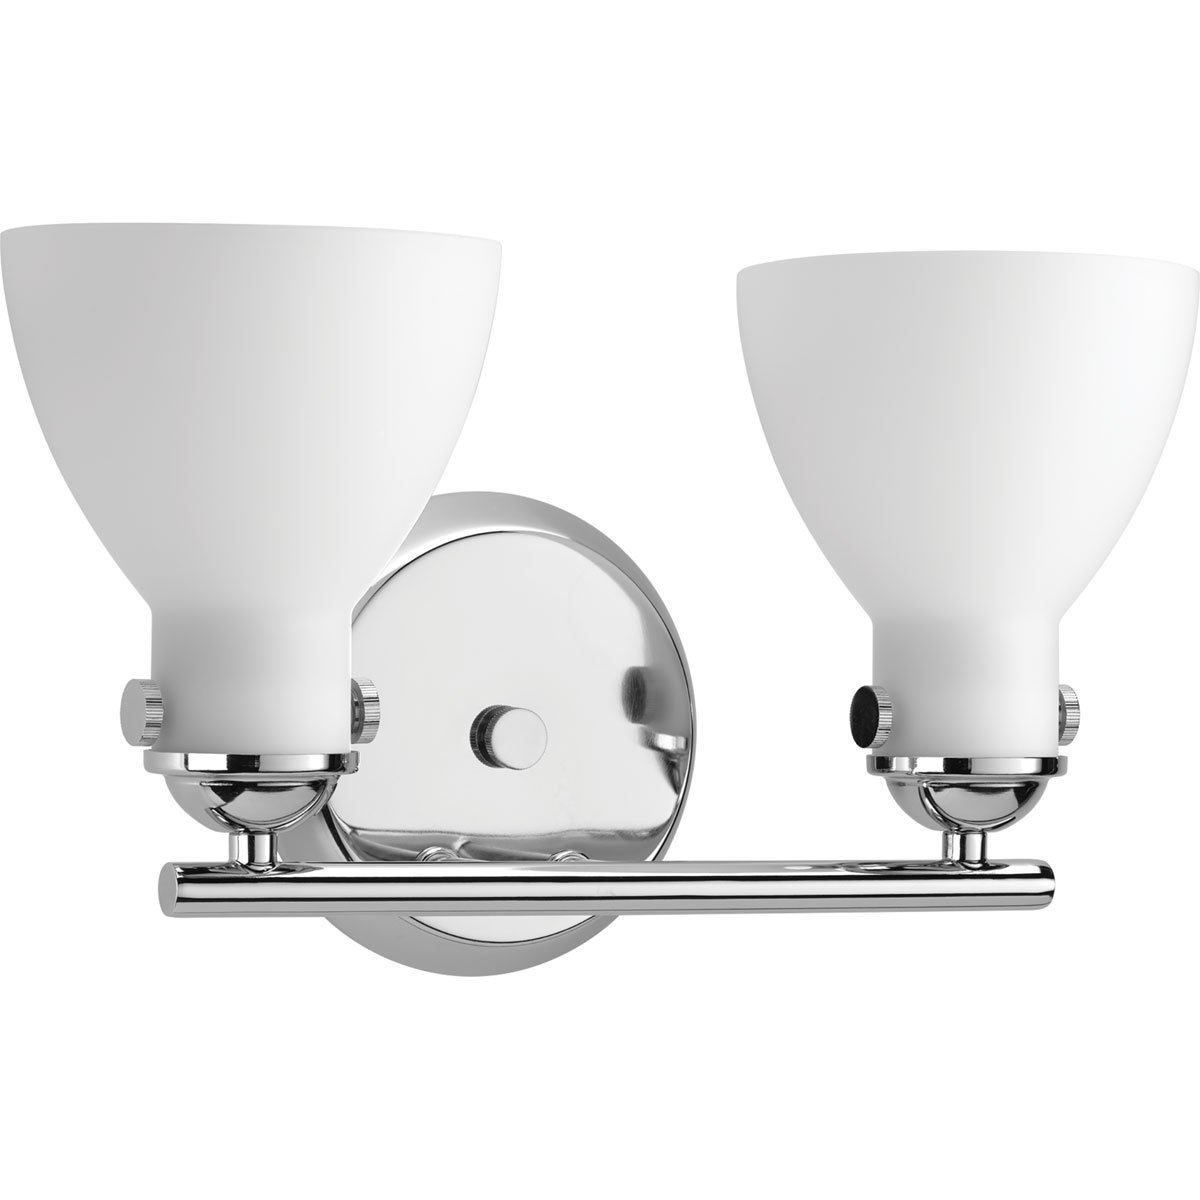 Progress Lighting P2771-15 Contemporary/Soft 2-100W Med Bath Bracket, Polished Chrome by Progress Lighting B01AISJJW8 15447 光沢クロム 光沢クロム